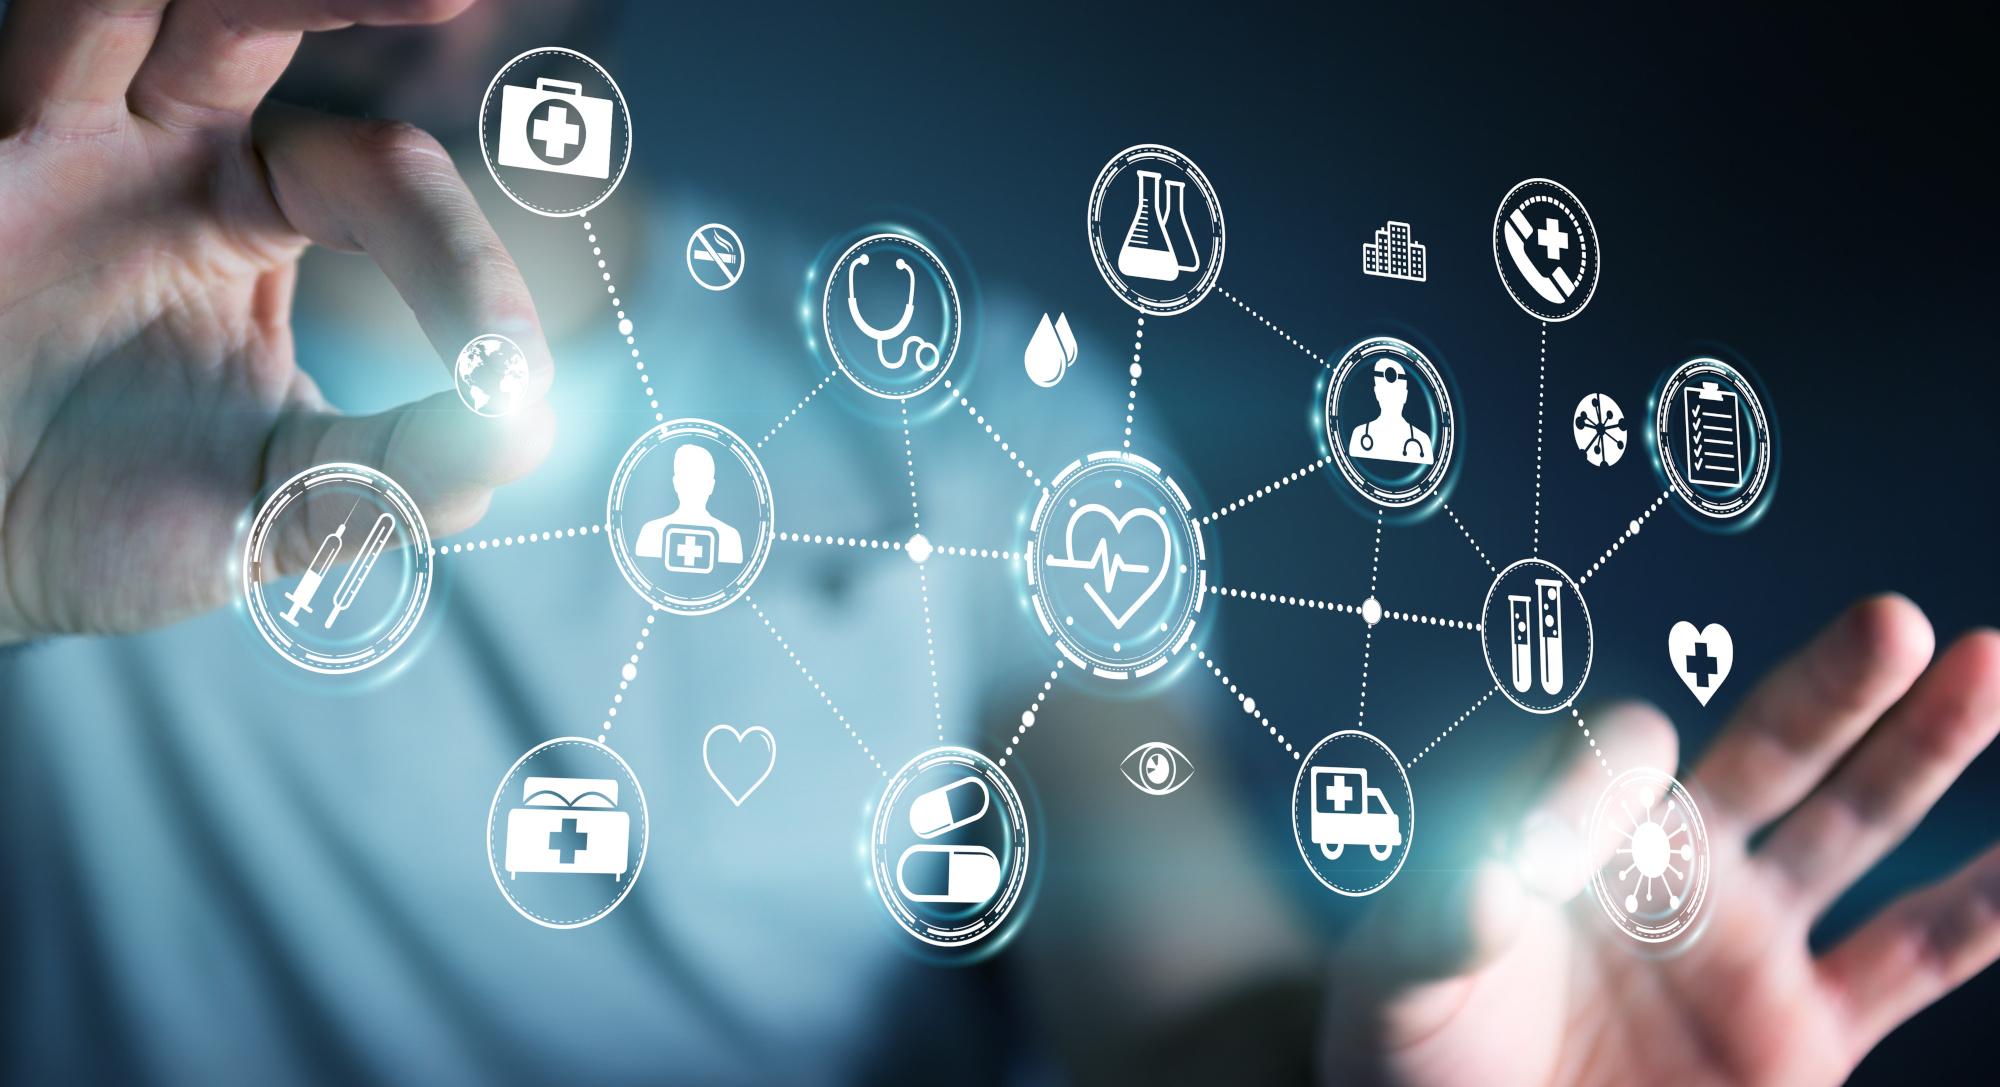 Future-proofing pharmacies